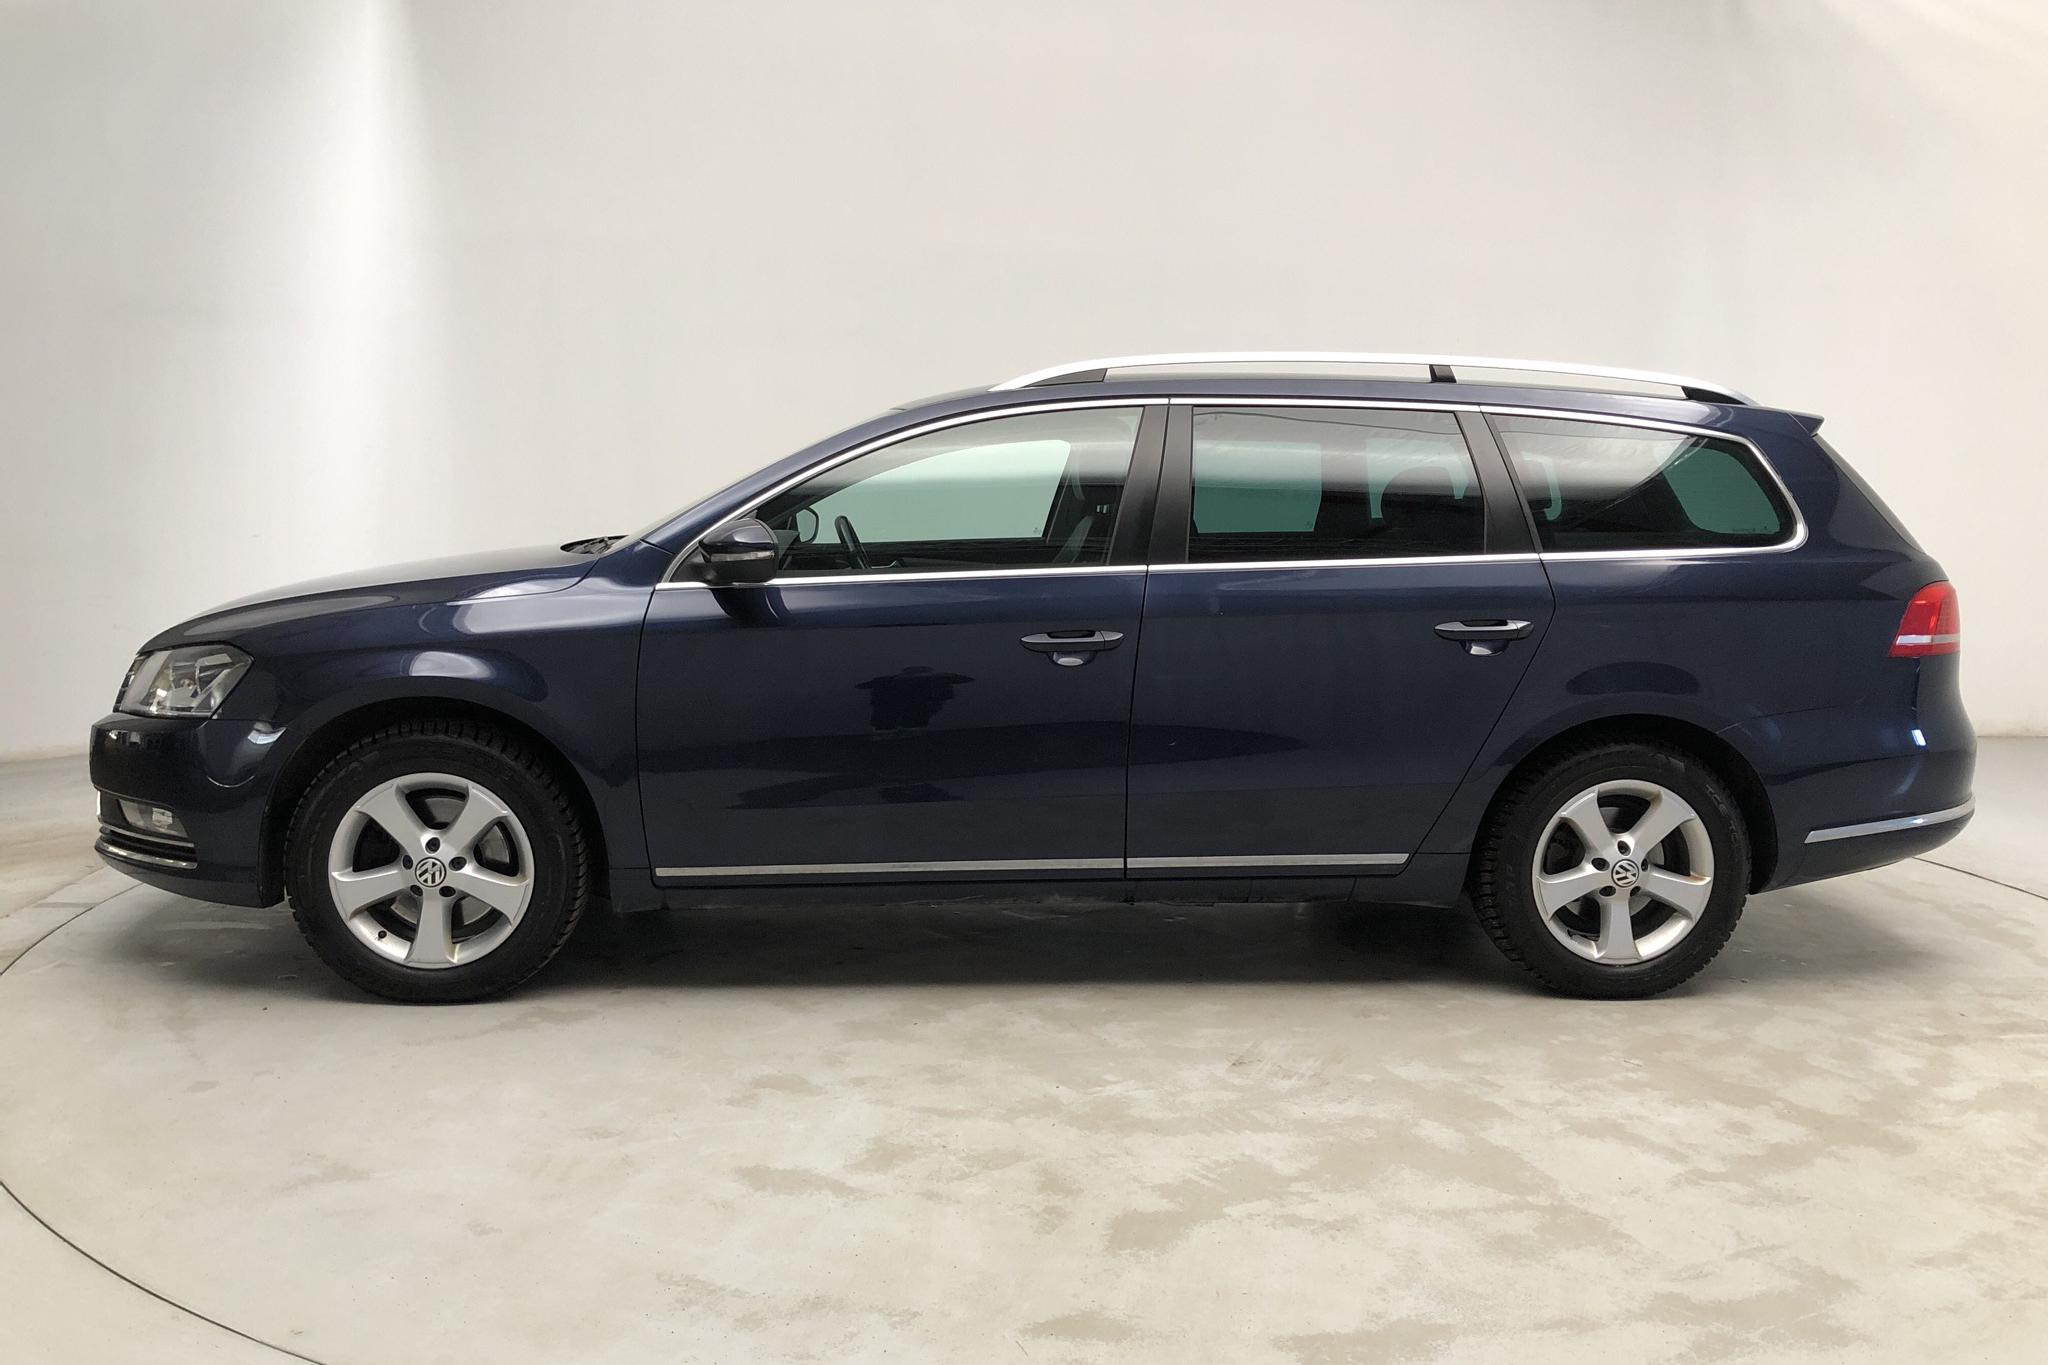 VW Passat 1.4 TSI EcoFuel Variant (150hk) - 8 800 mil - Automat - Dark Blue - 2014